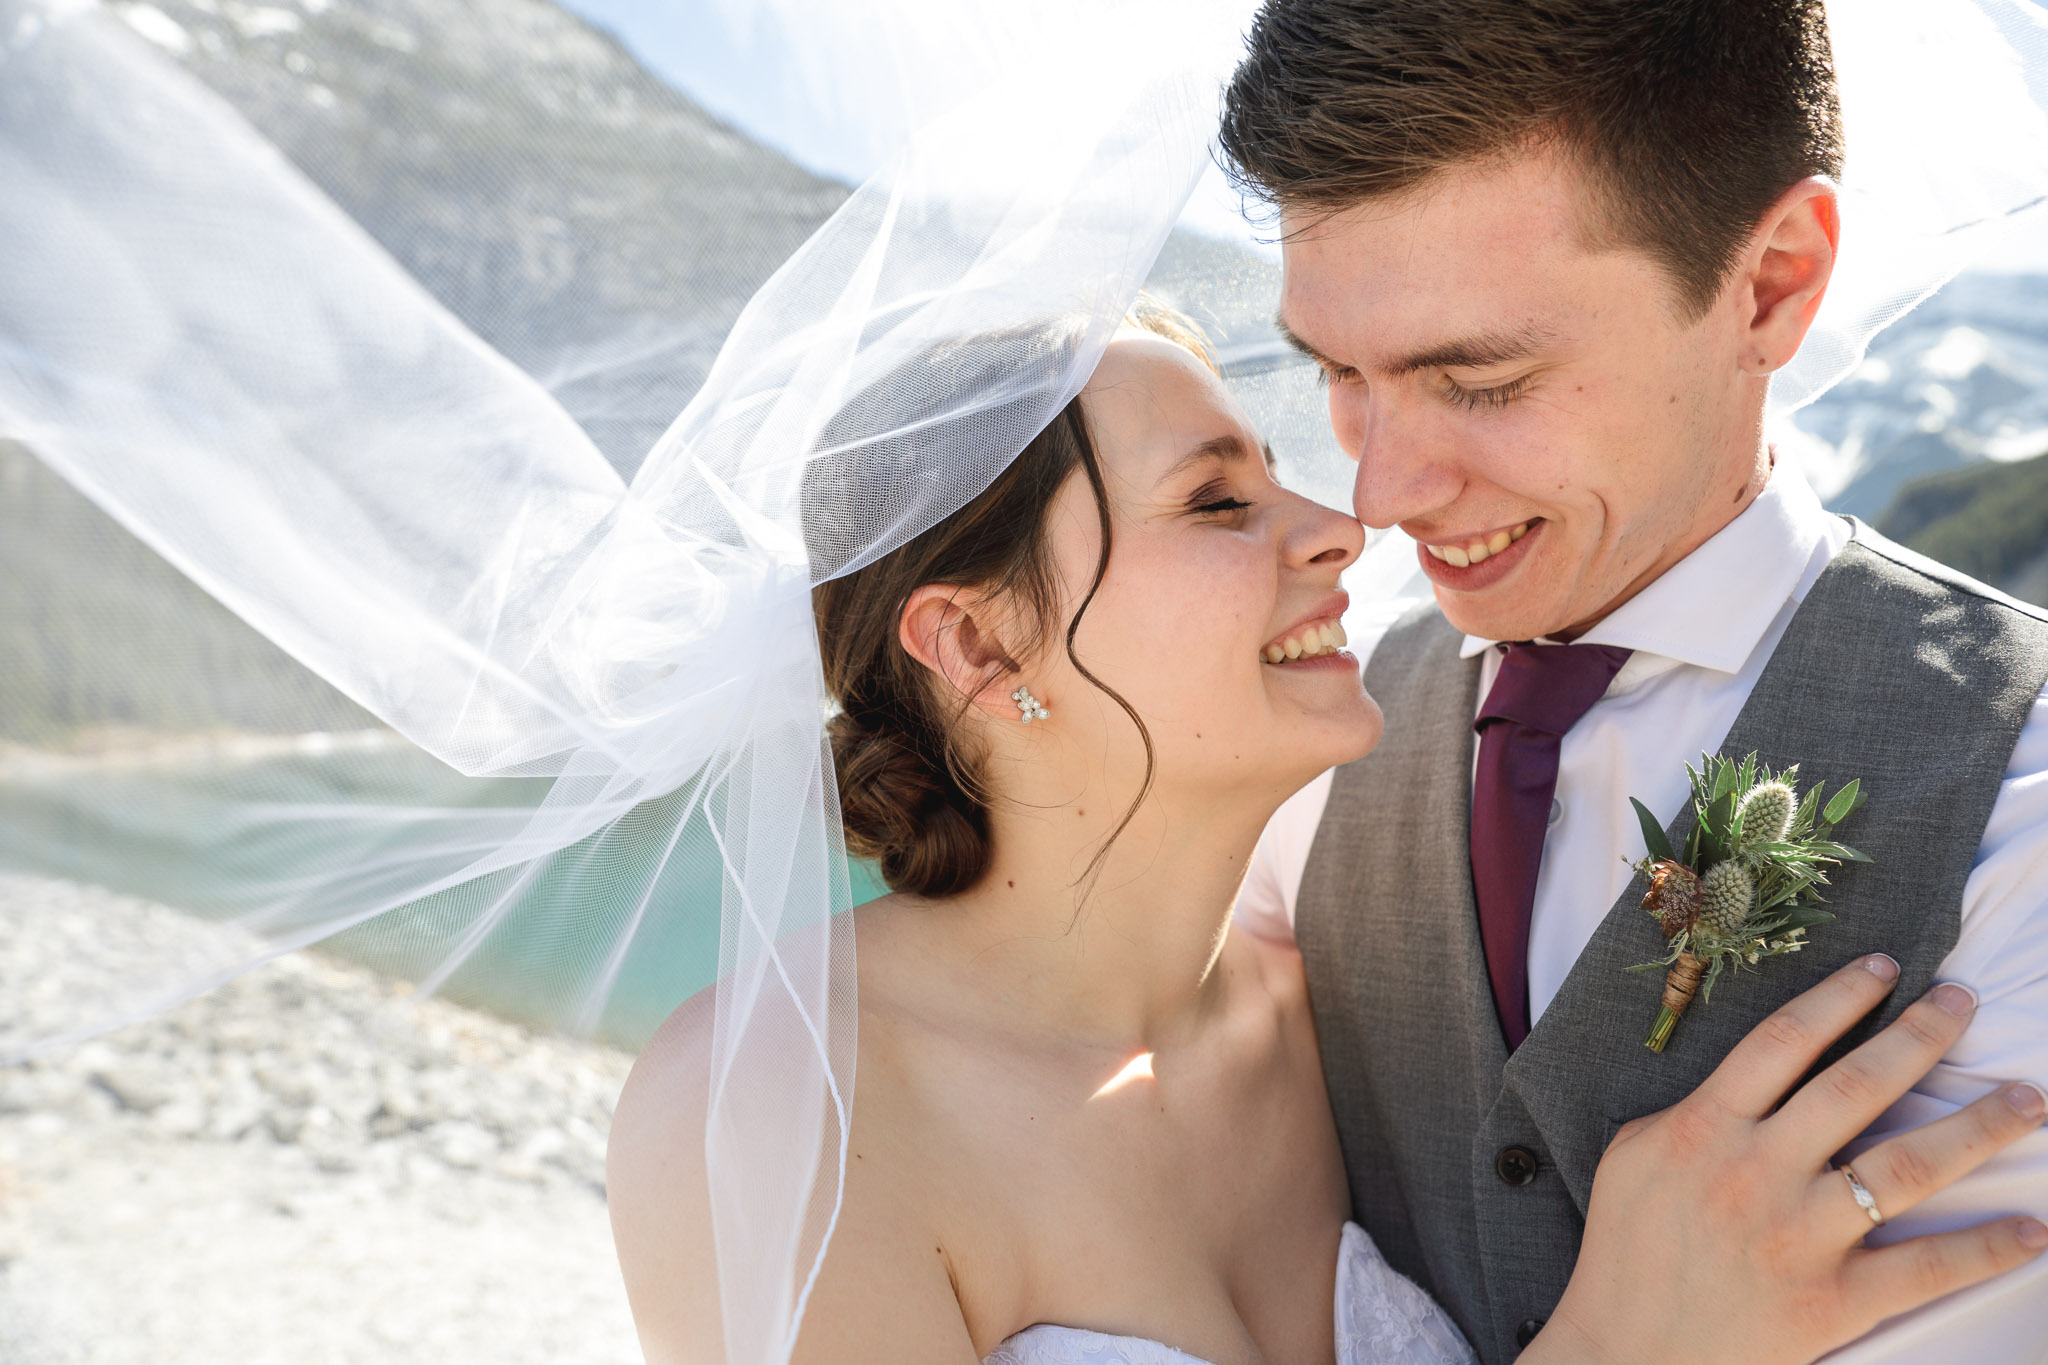 AshleyDaphnePhotography-EmilyGraham_Wedding_204805_c2bc396906dac06d99959c5eb849dba0